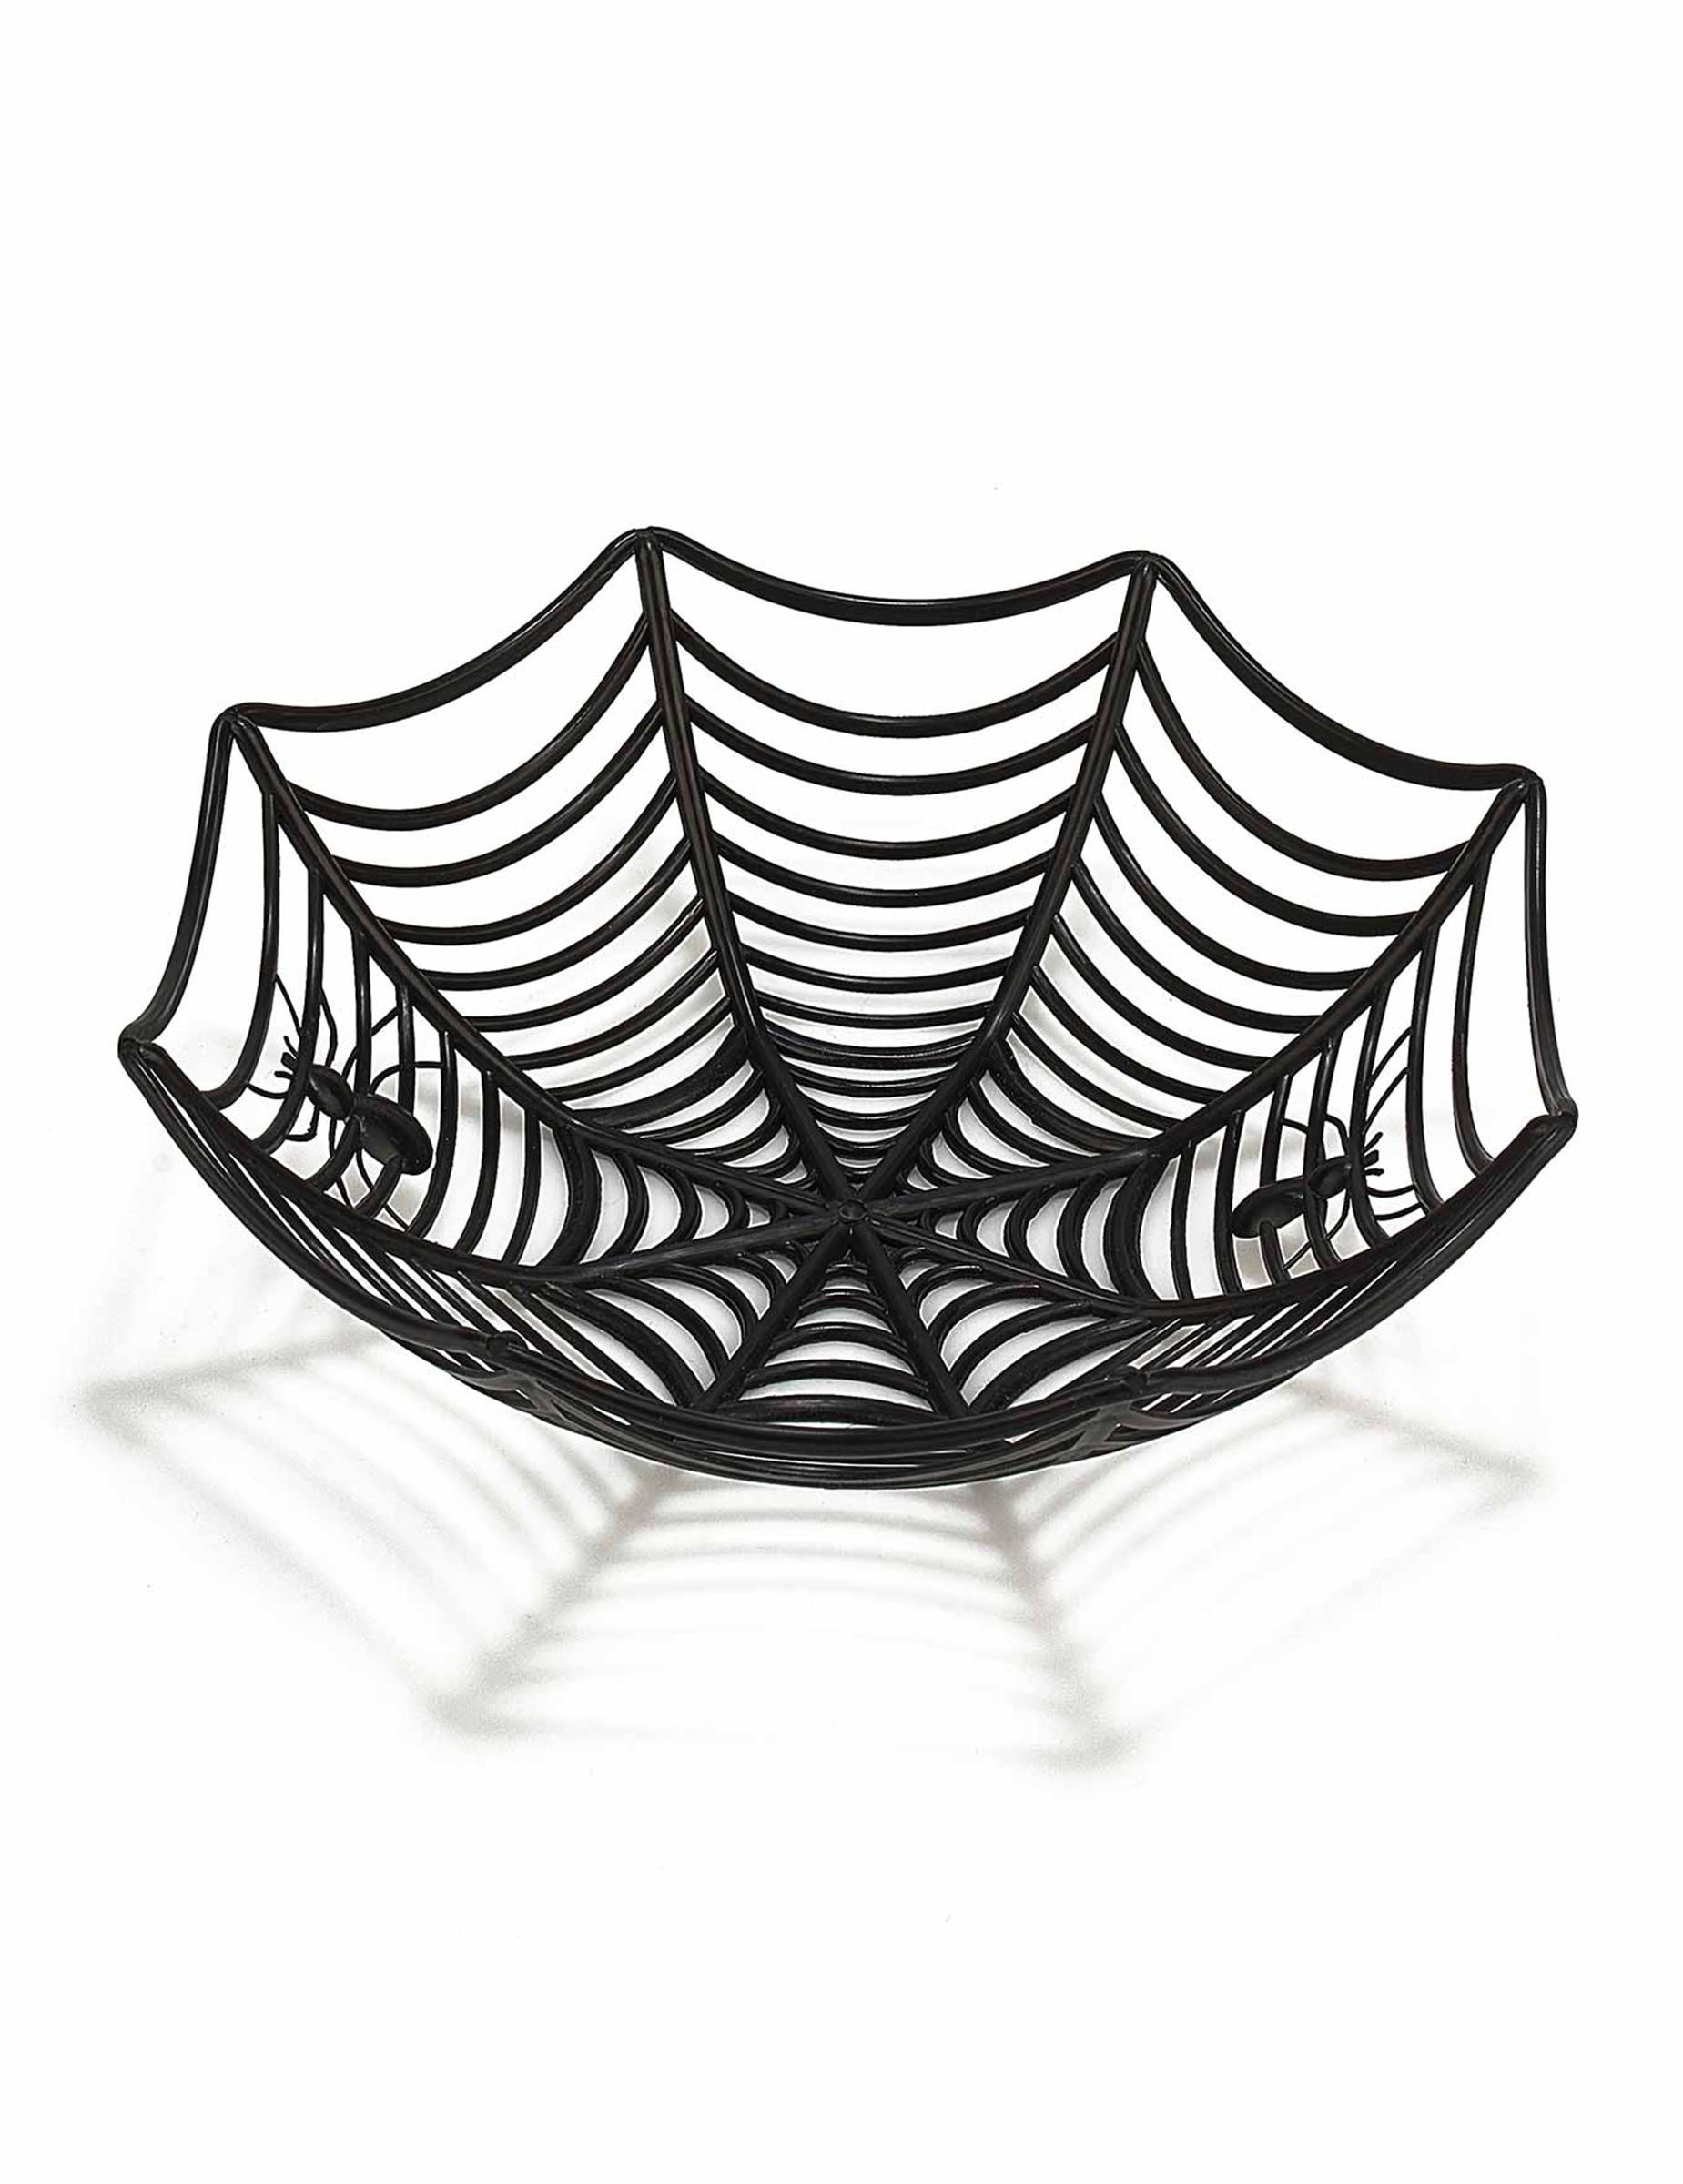 saladier toile d 39 araign e 27 cm halloween d coration. Black Bedroom Furniture Sets. Home Design Ideas